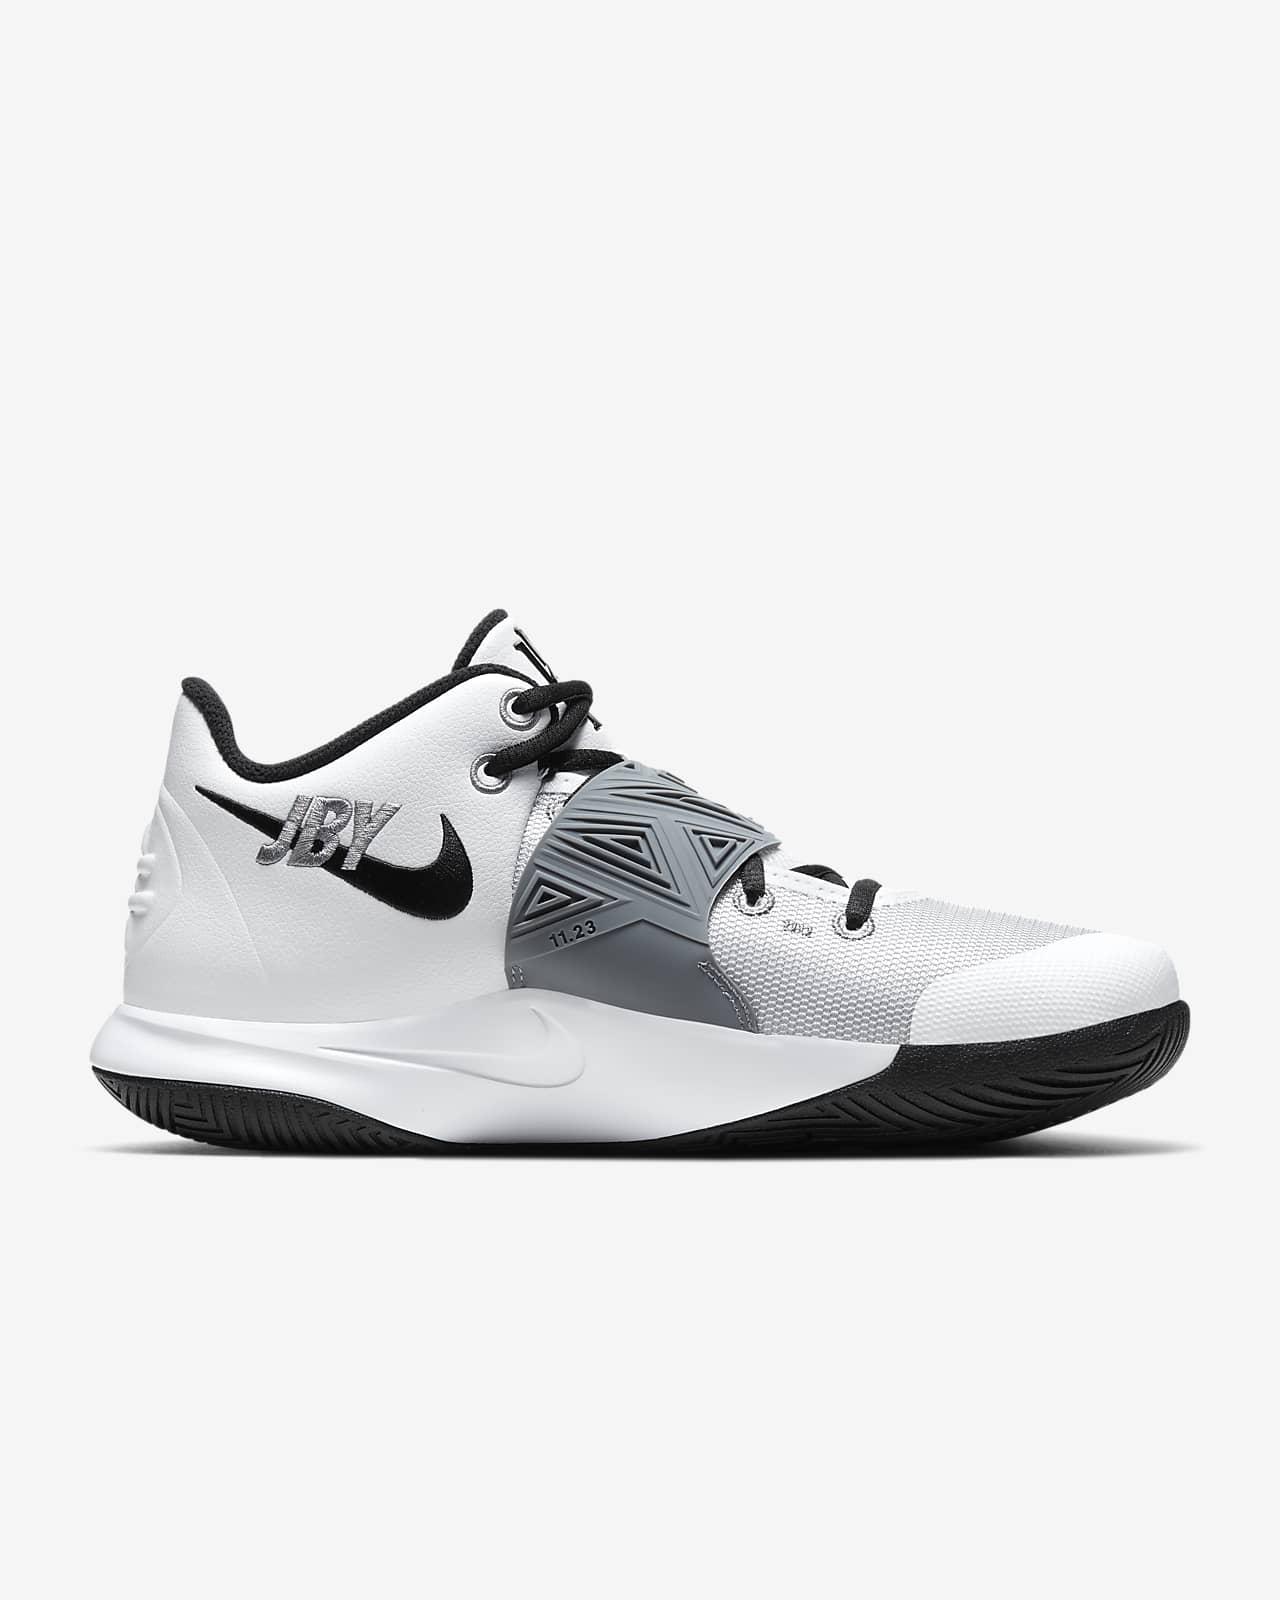 Kyrie Flytrap 3 EP Basketball Shoe. Nike JP